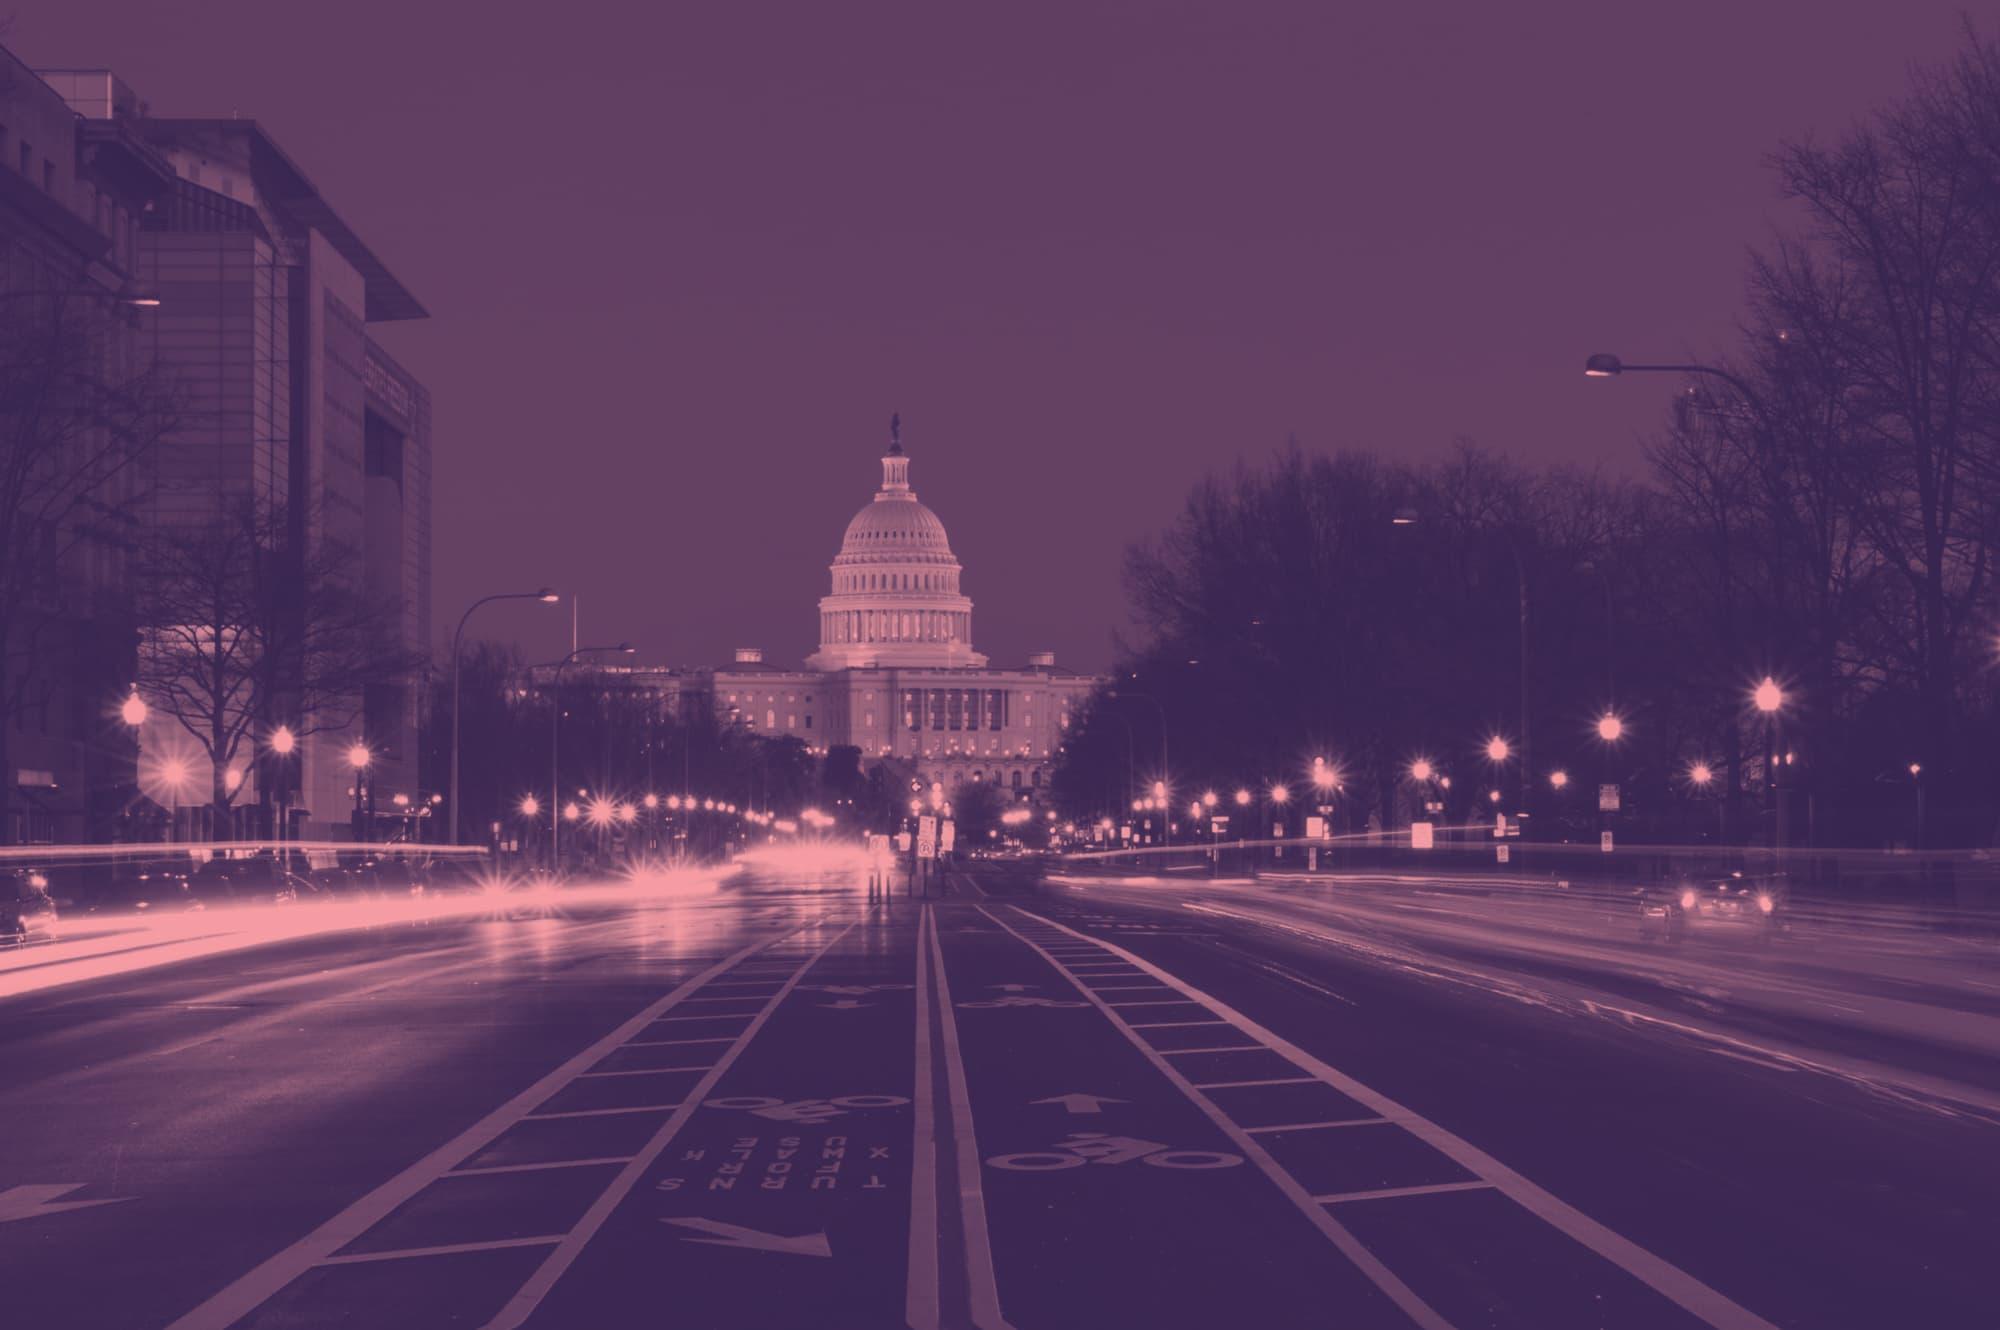 Image of Pennsylvania Ave NW in Washington, DC